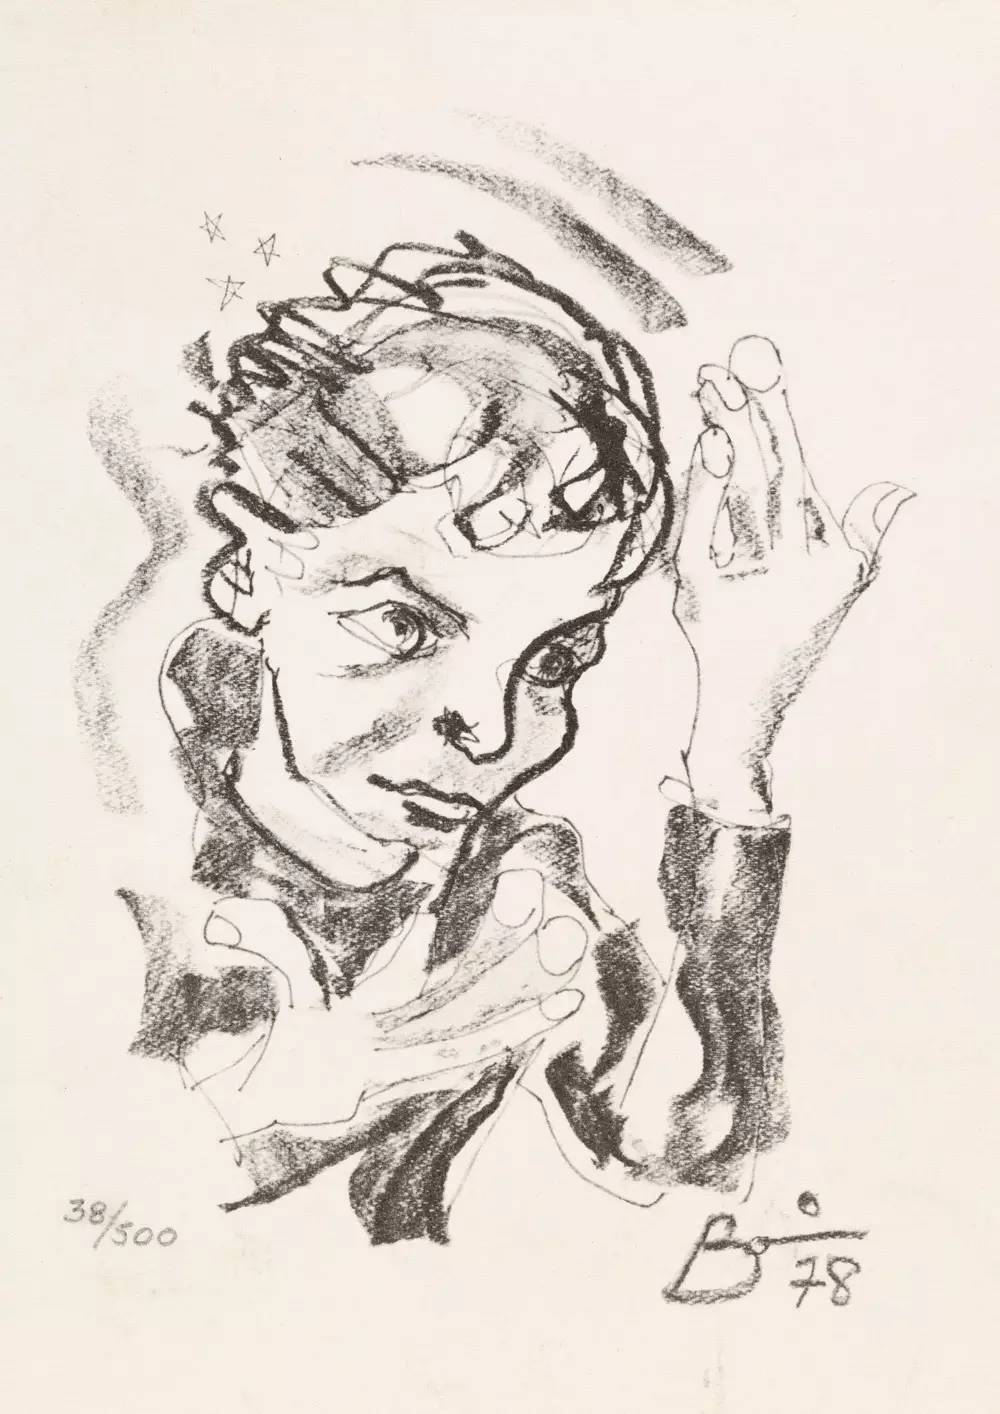 David-Bowie-paintings-selfportrait3